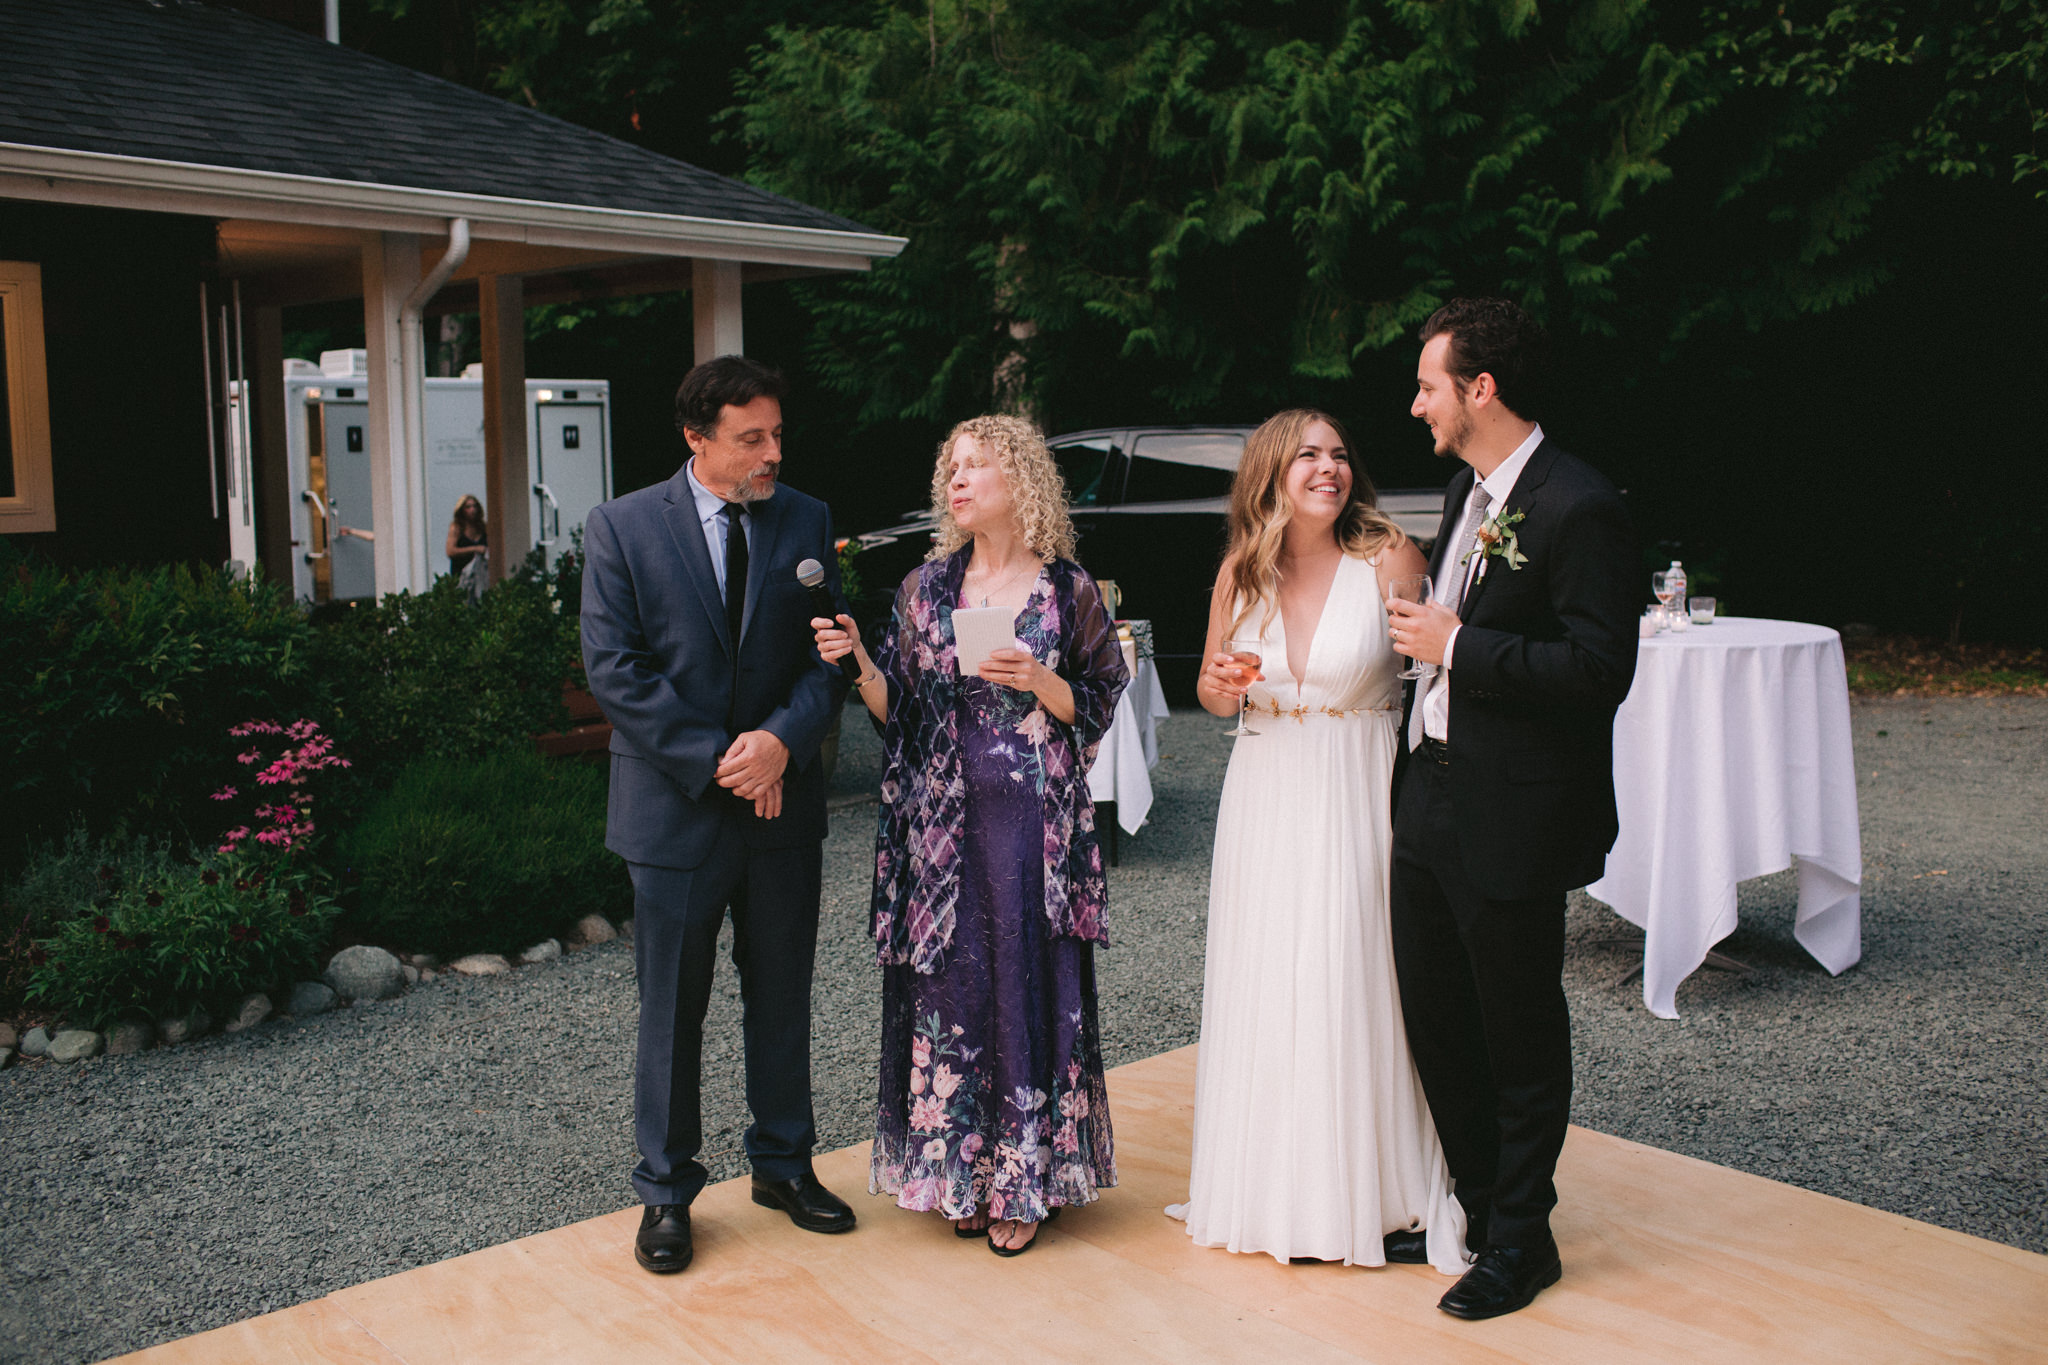 Backyard-Bainbridge-Island-Wedding-Alycia-Lovell-Photography-185.JPG